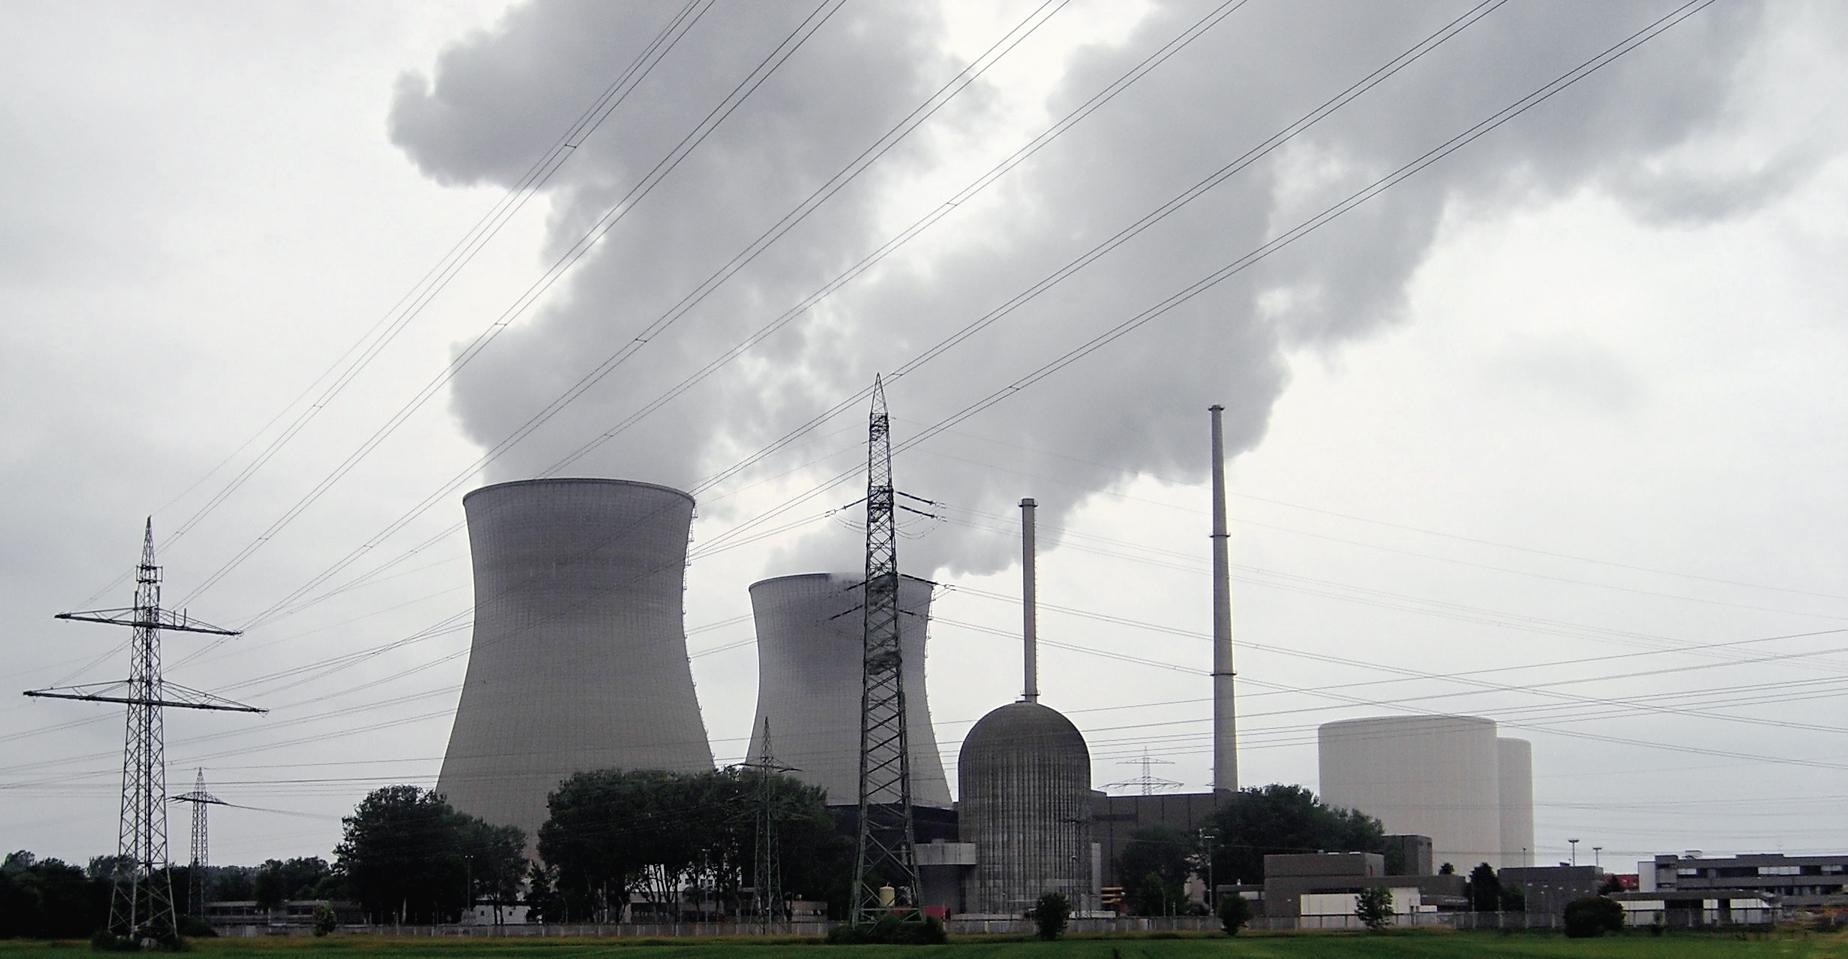 Datei:Kernkraftwerk Gundremmingen 1a.jpg